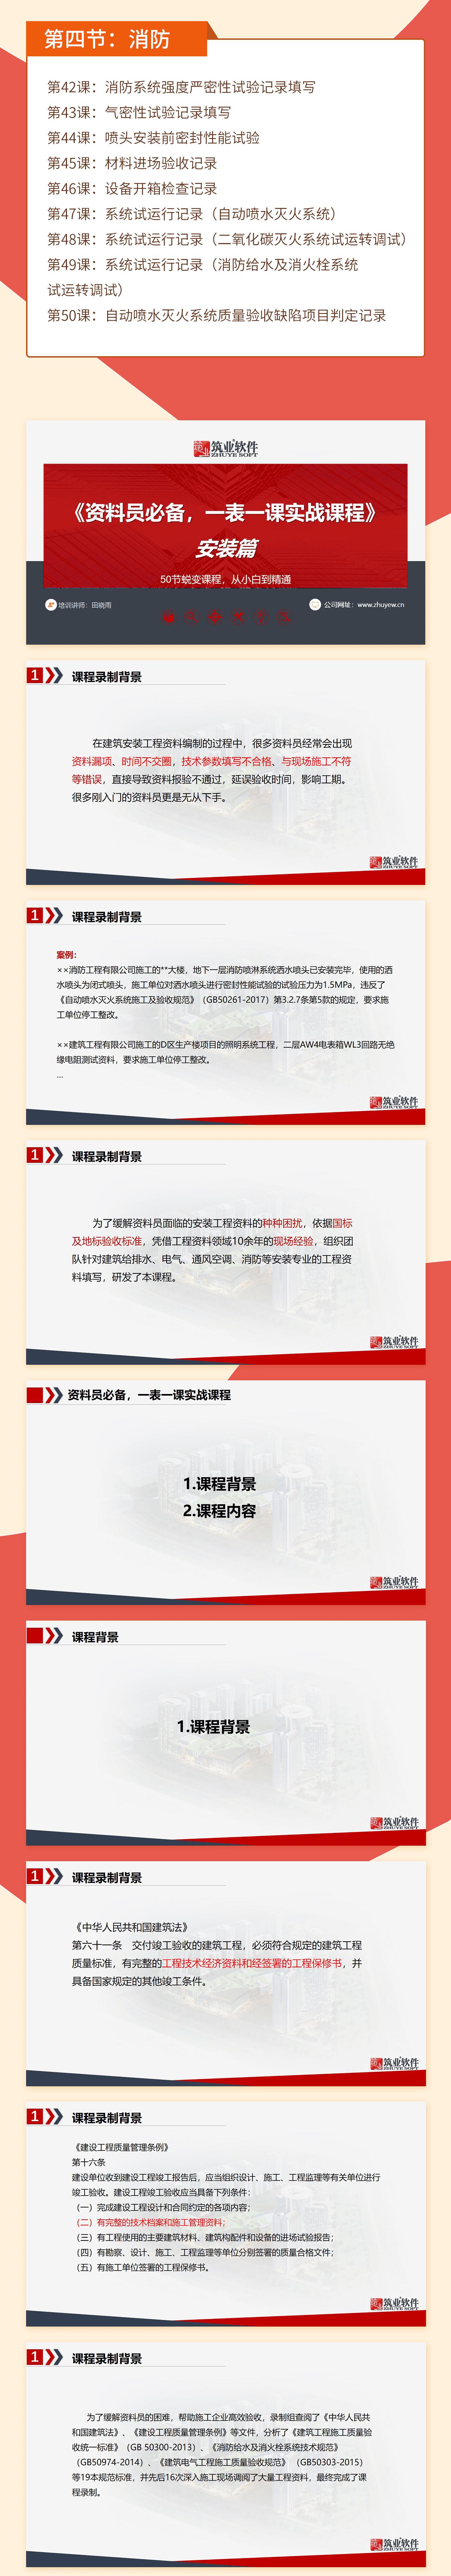 安装详情_02.png